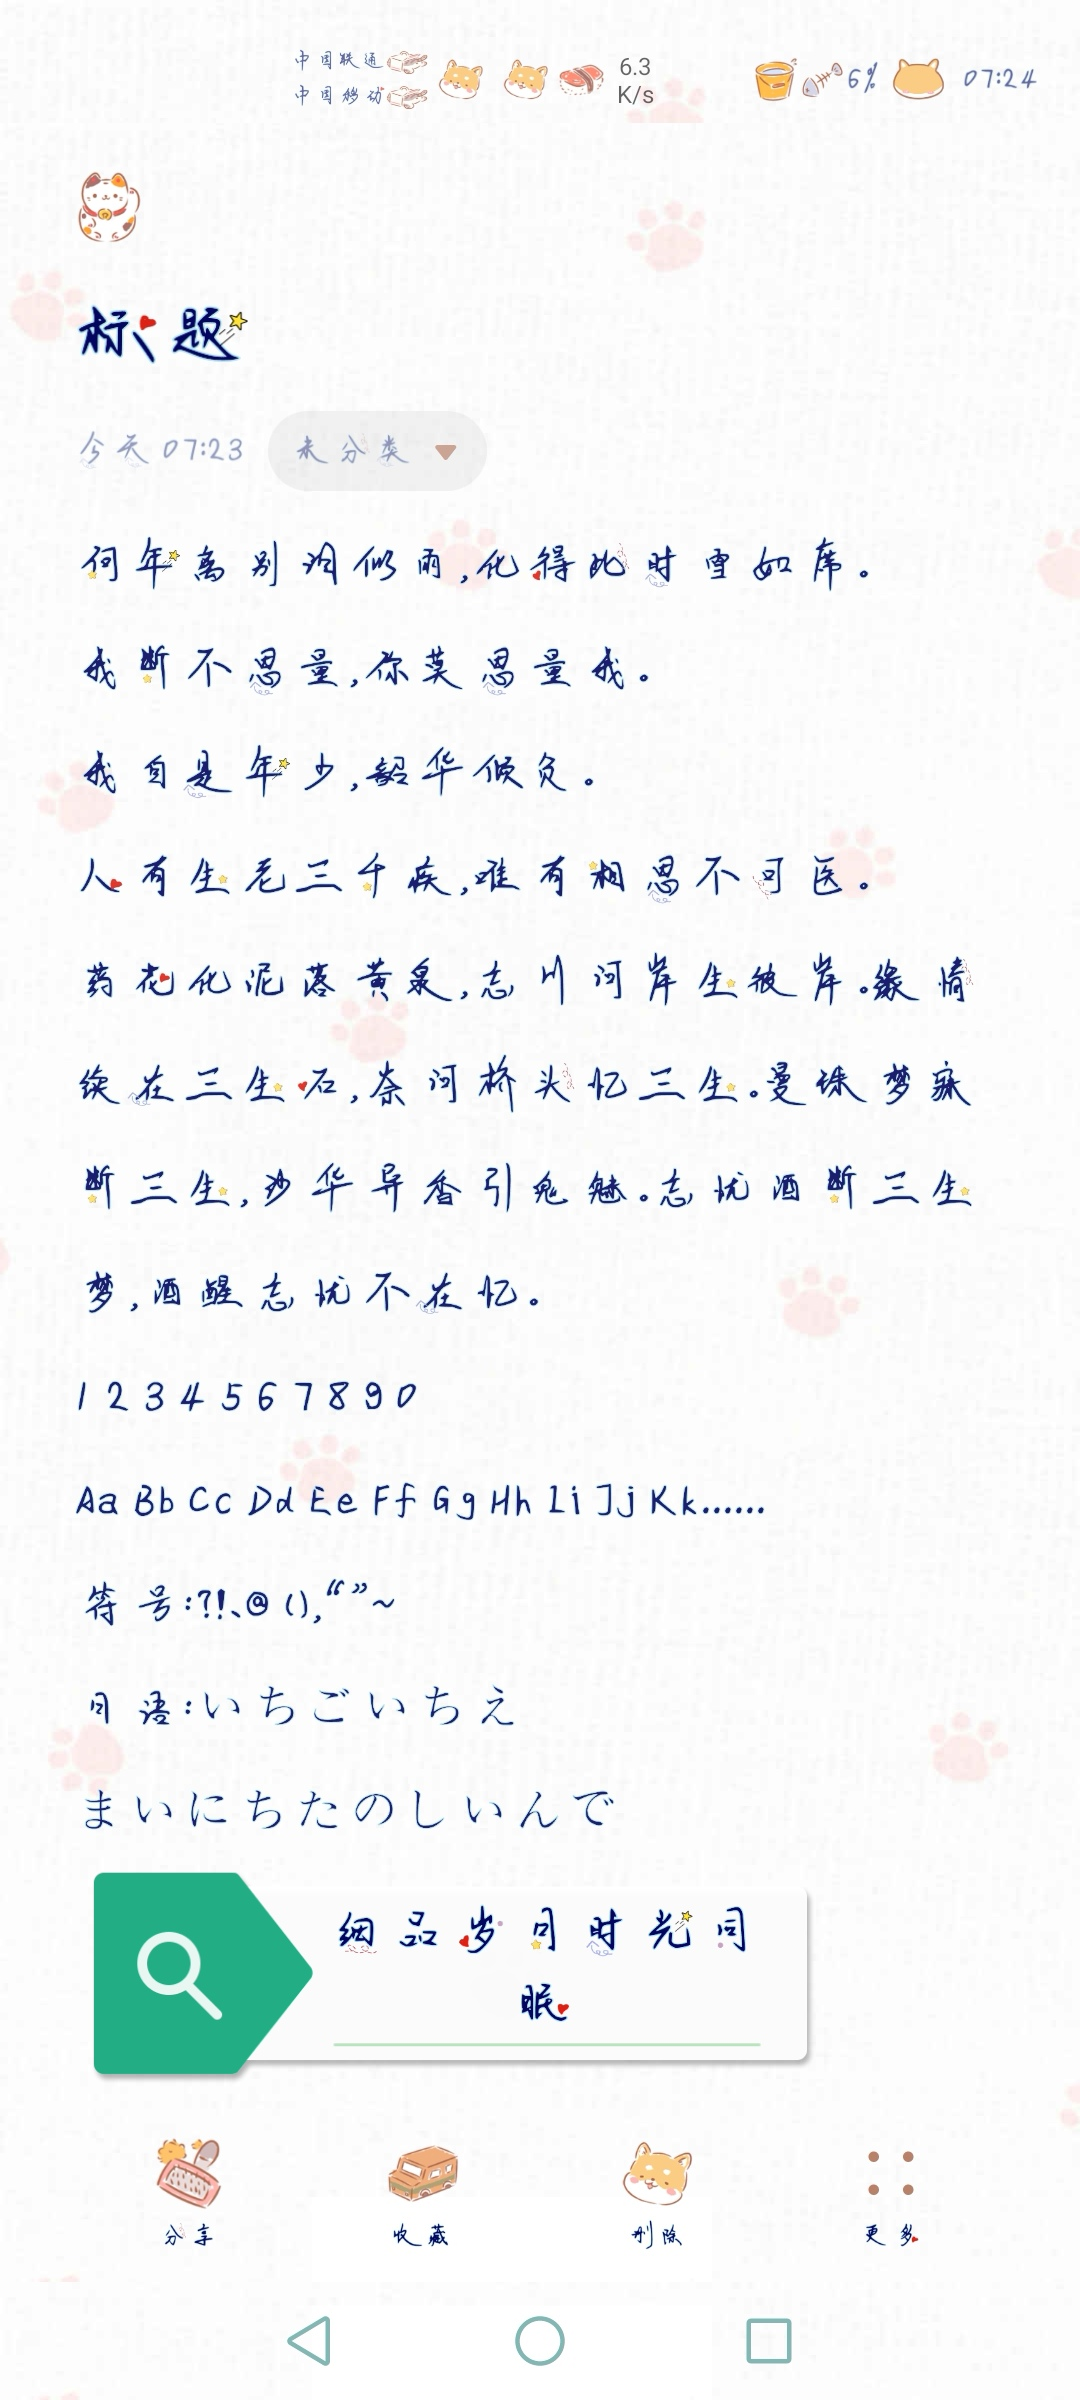 Screenshot_20210805_072412_com.huawei.notepad_edit_587512997307225.jpg